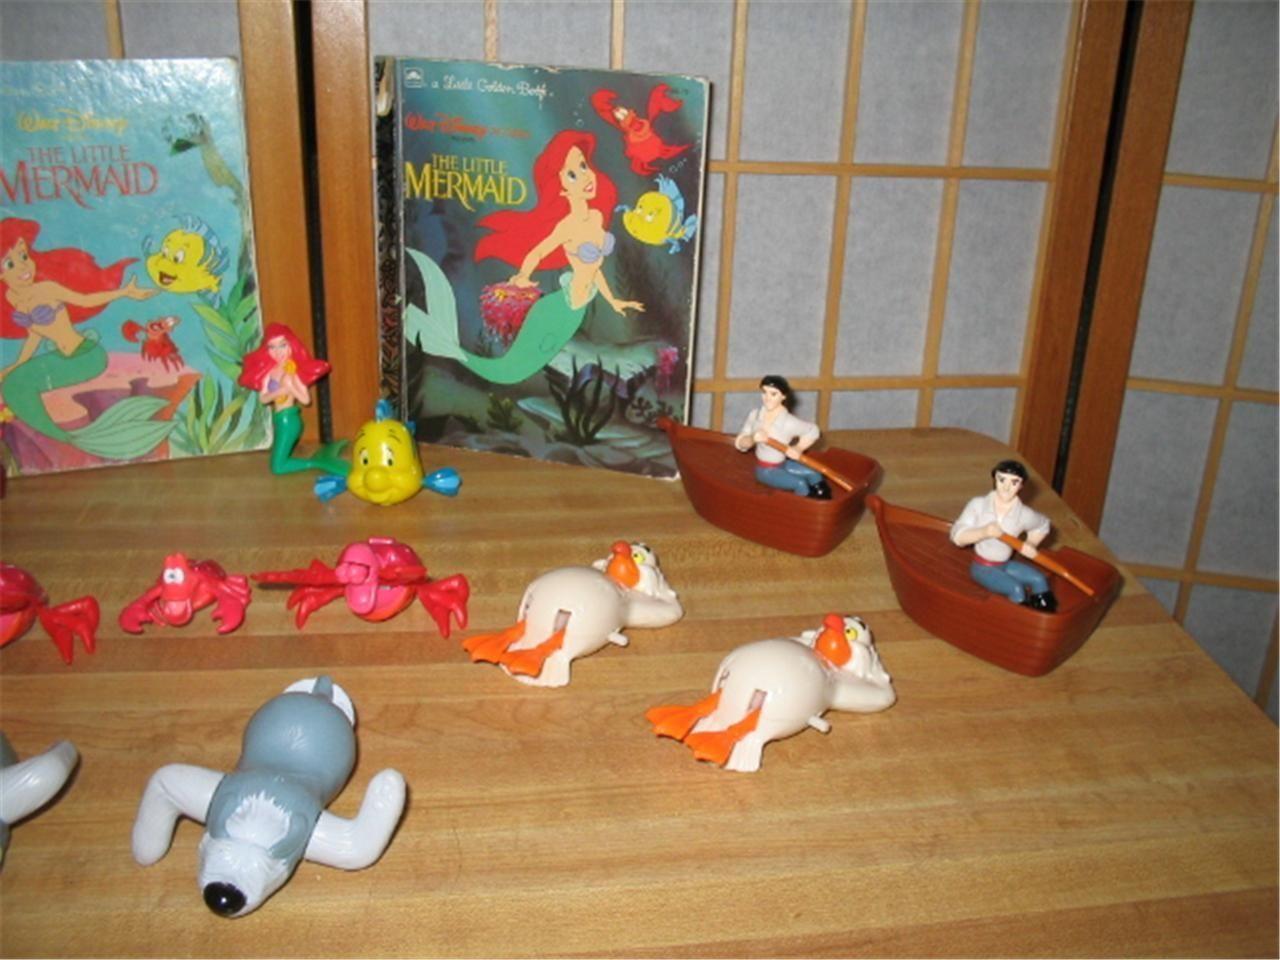 Little Mermaid Vintage 1991-92 TOYS 18 pcs & 3 Little Golden Books Disney